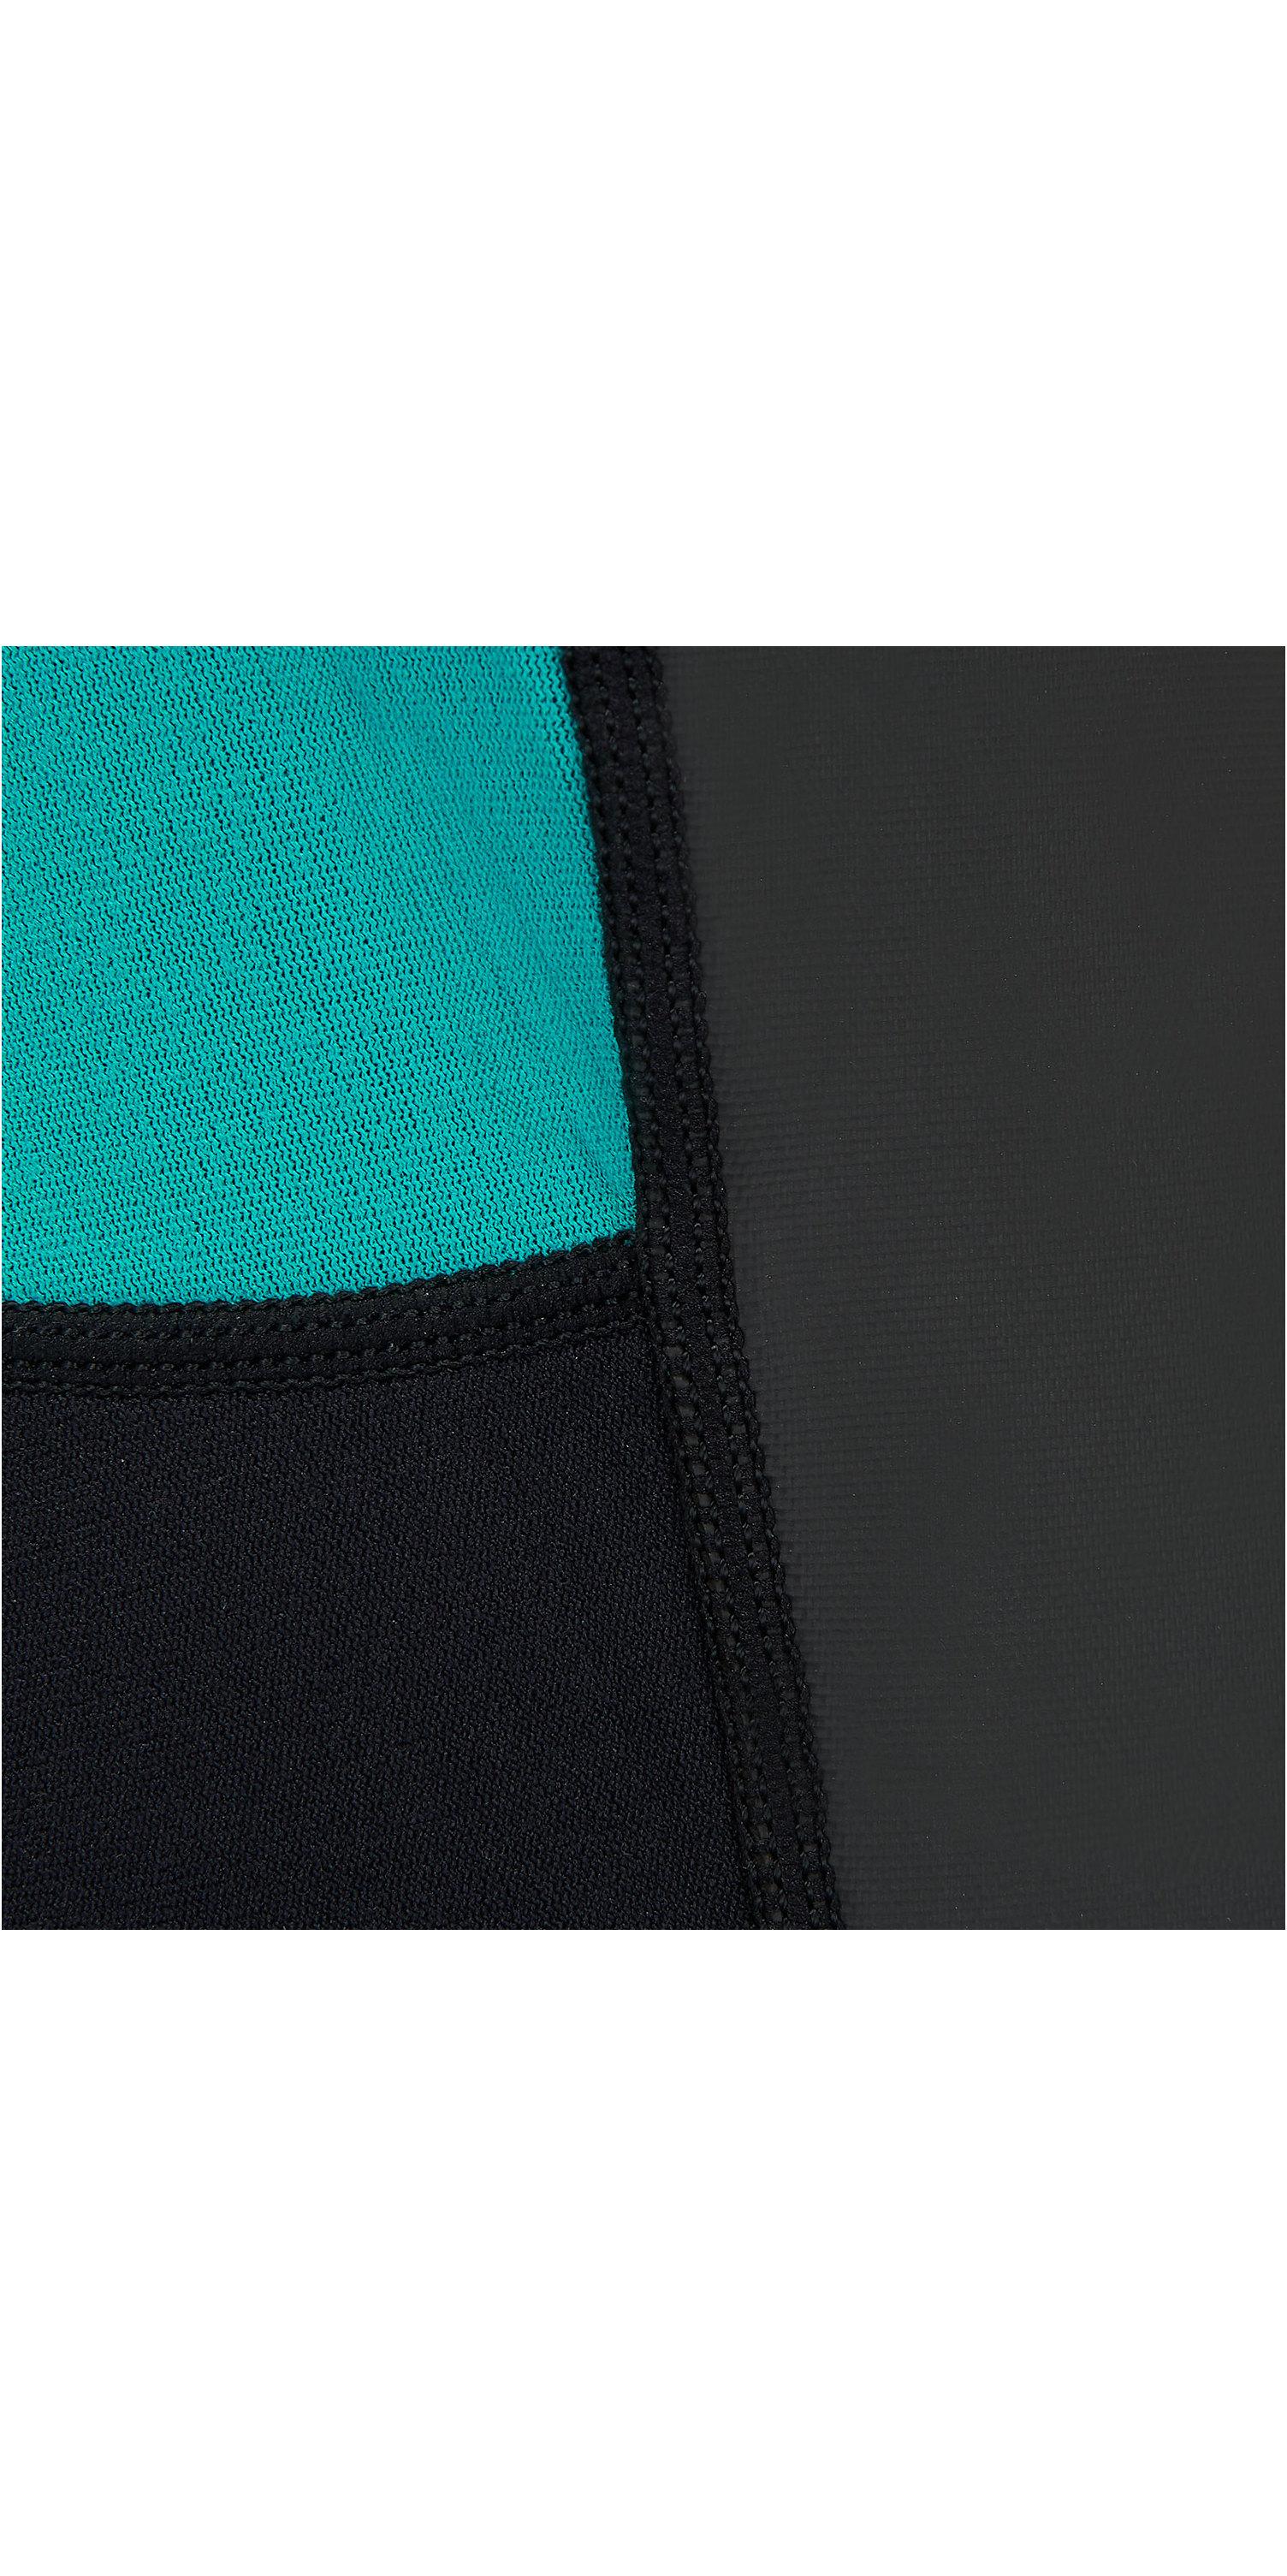 2019 Animal Womens Nova 3/2mm Flatlock Shorty Wetsuit Black AW9SQ303